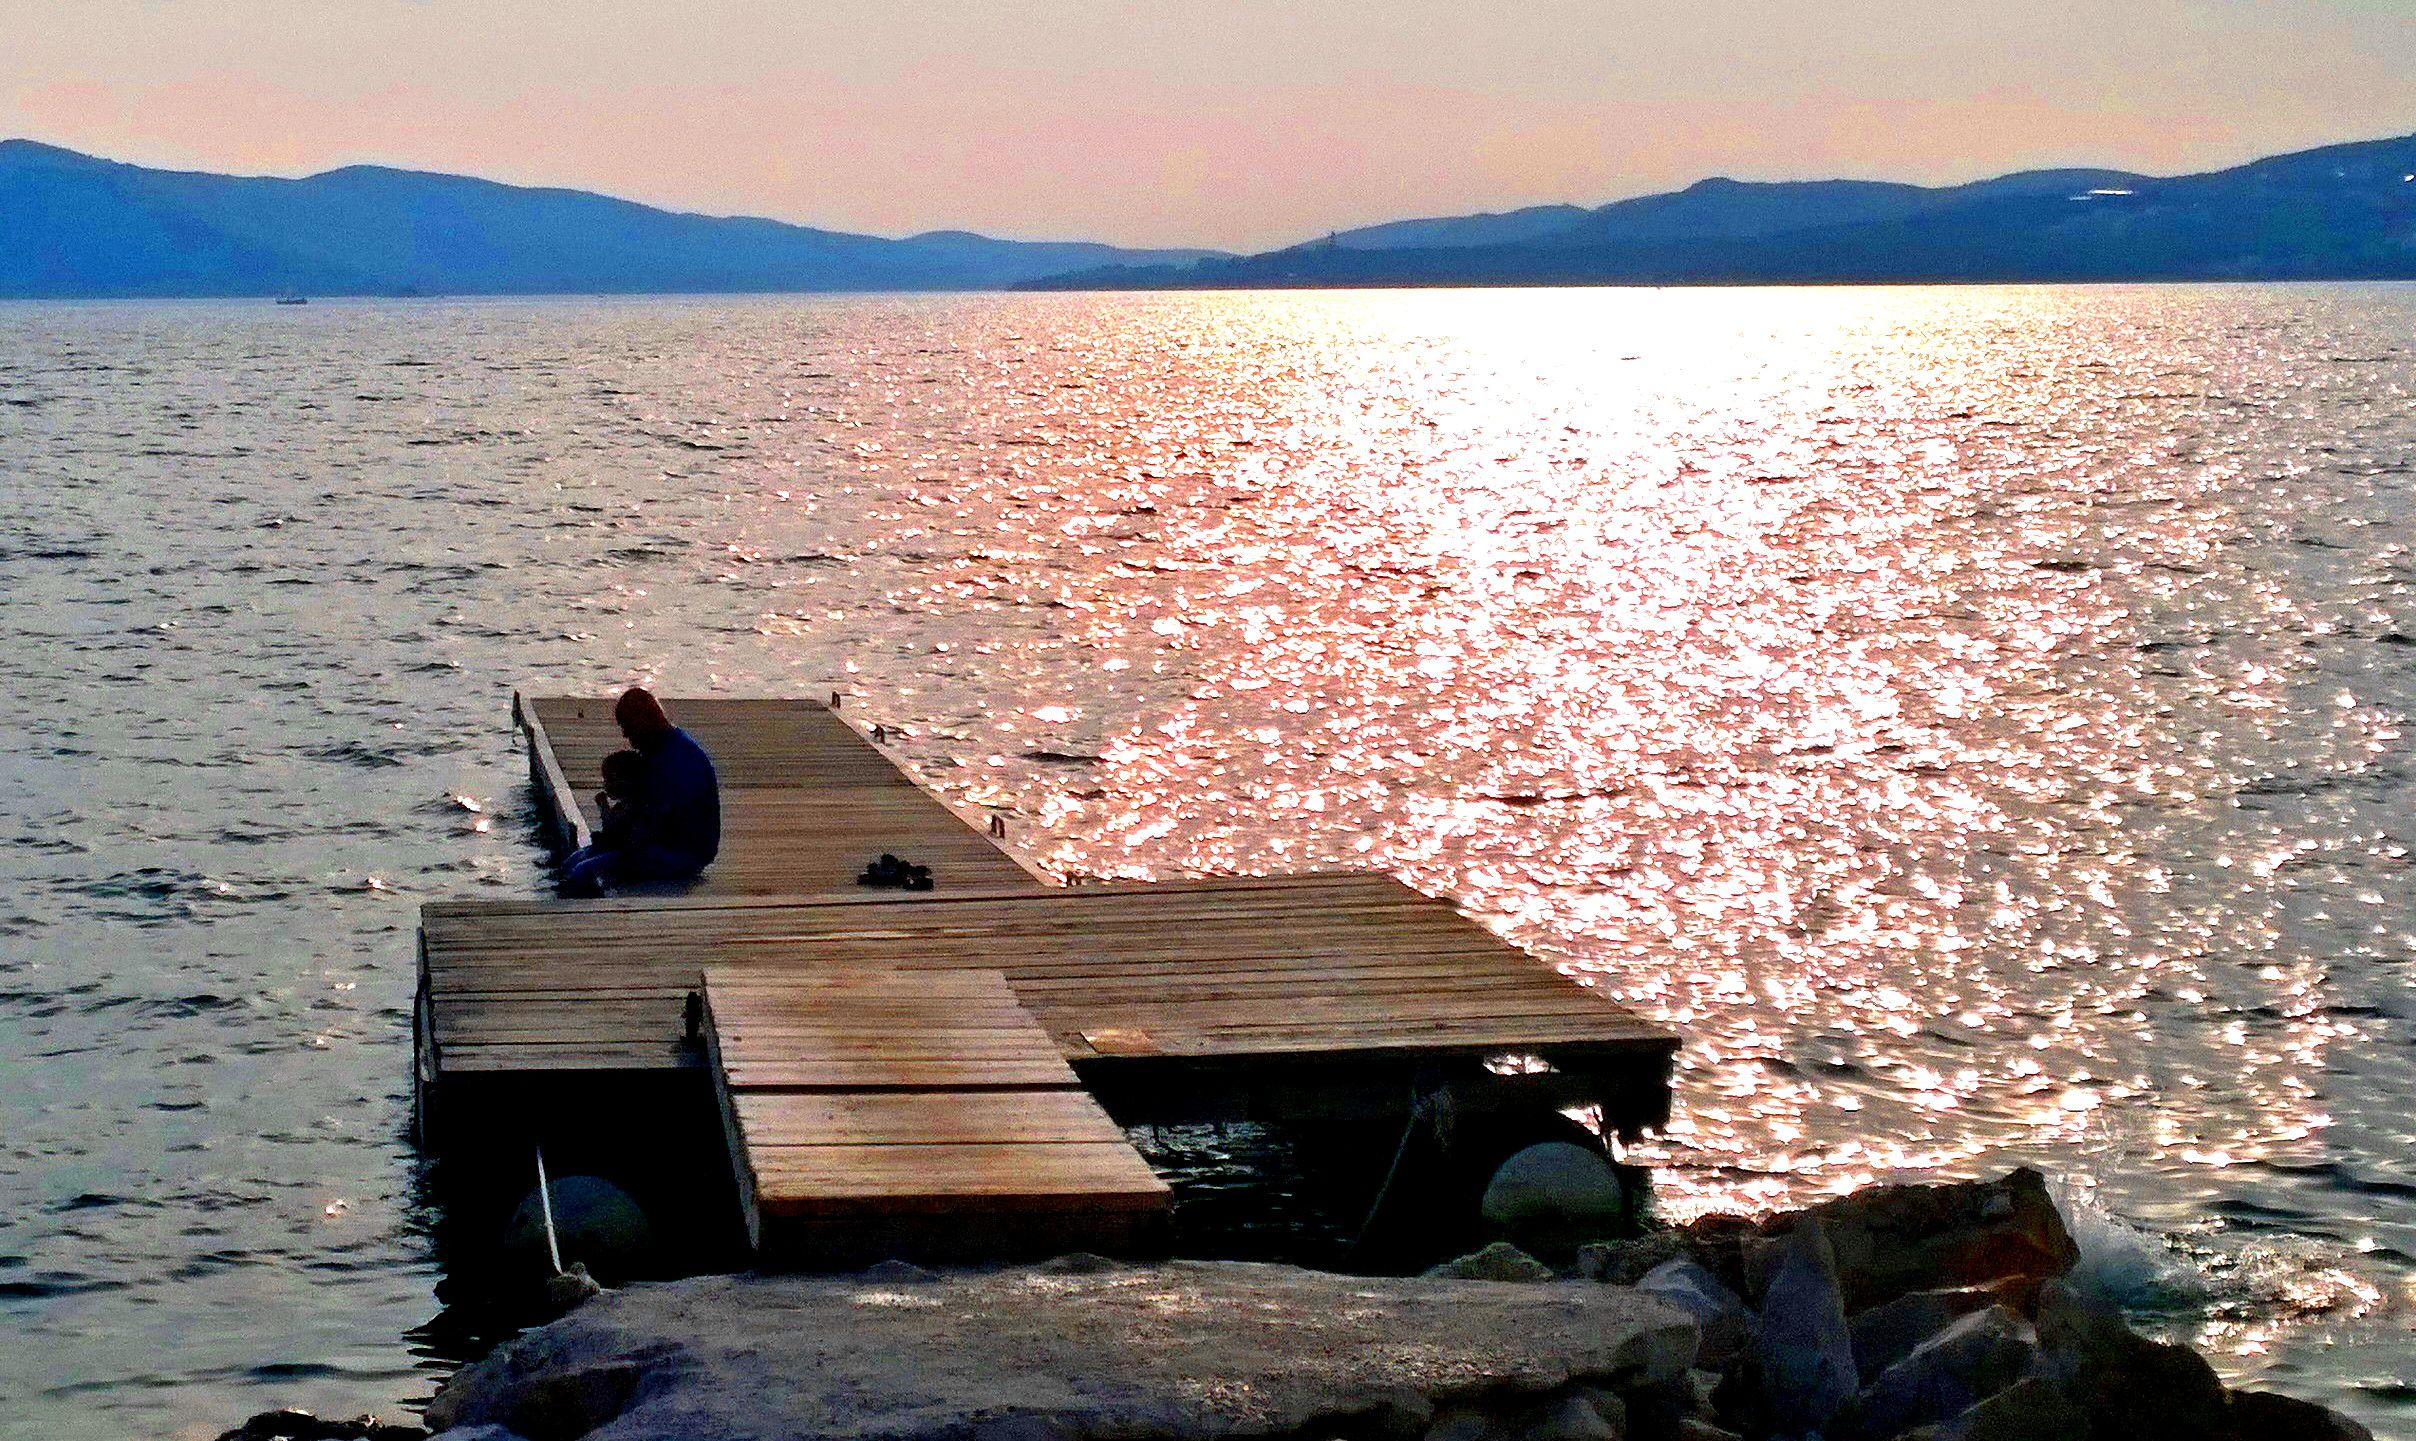 Around the corner from Trogir, Croatia.